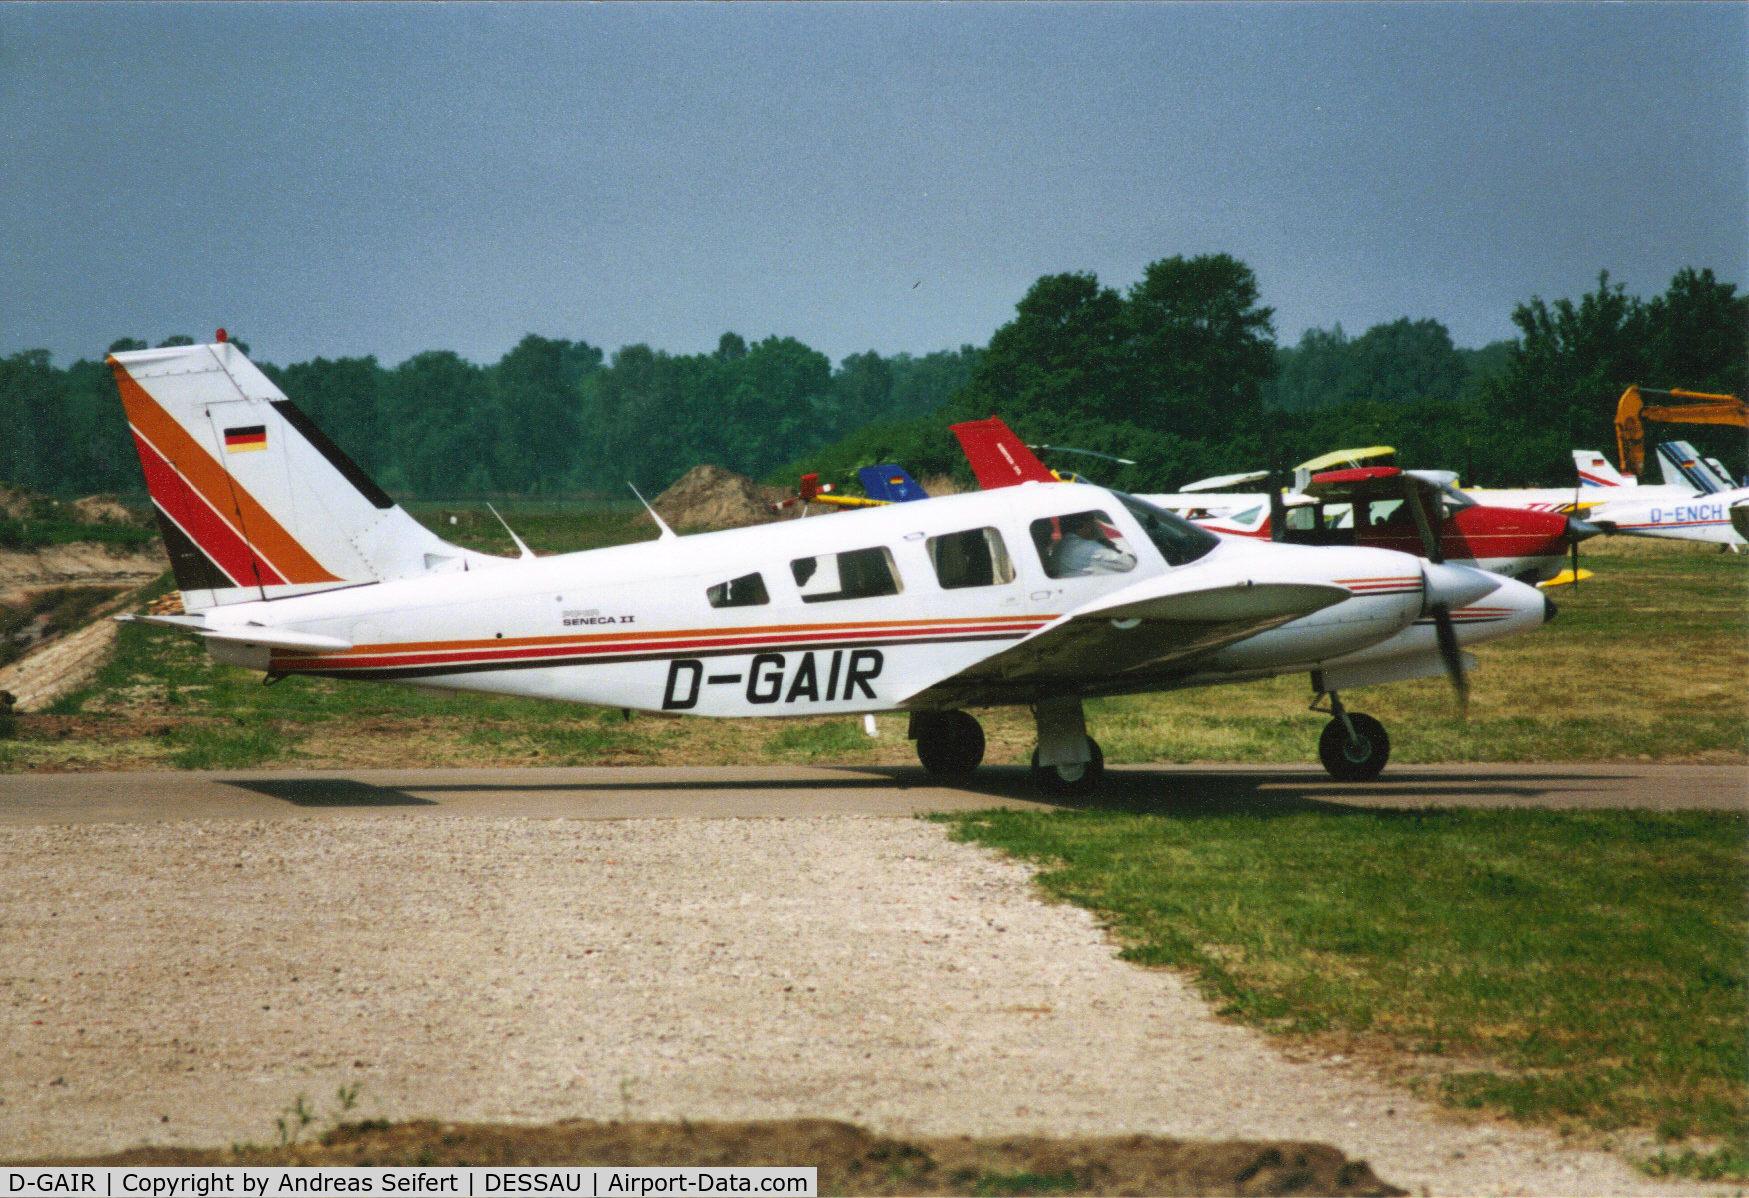 D-GAIR, Piper PA-34-200T Seneca II Seneca C/N 34-807003, Dessau 2001